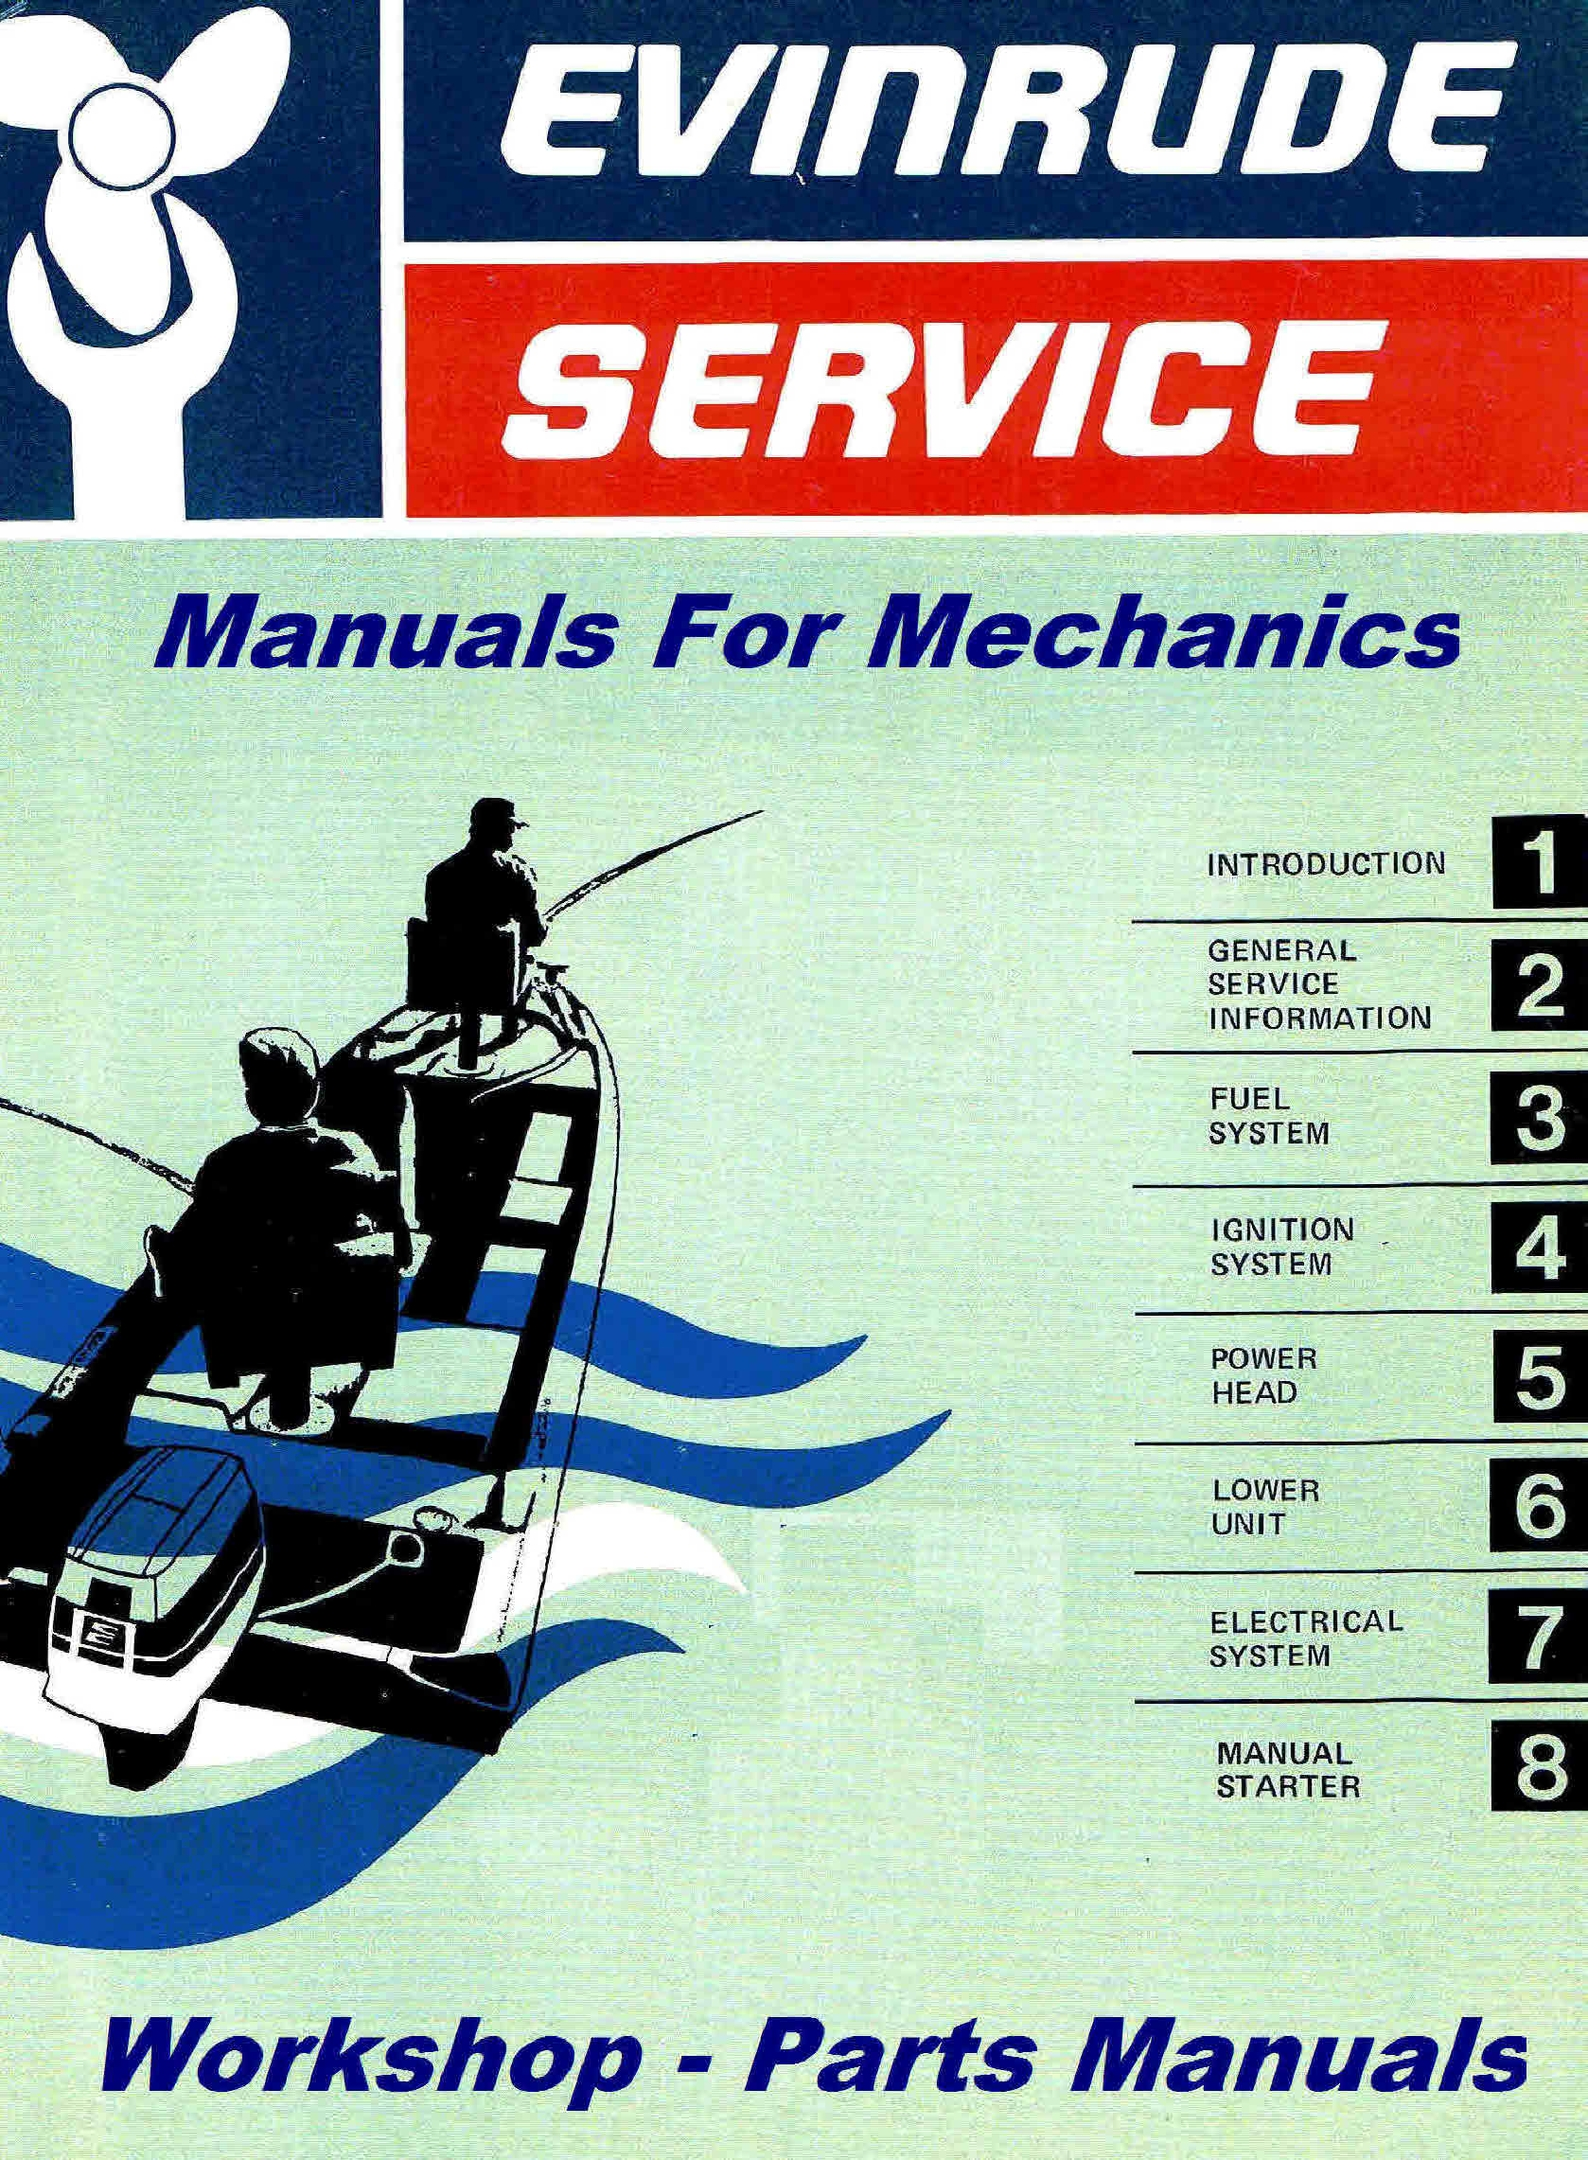 1968 evinrude 6hp service manual manual p n 278645 428 array themanualman rh sellfy com fandeluxe Choice Image